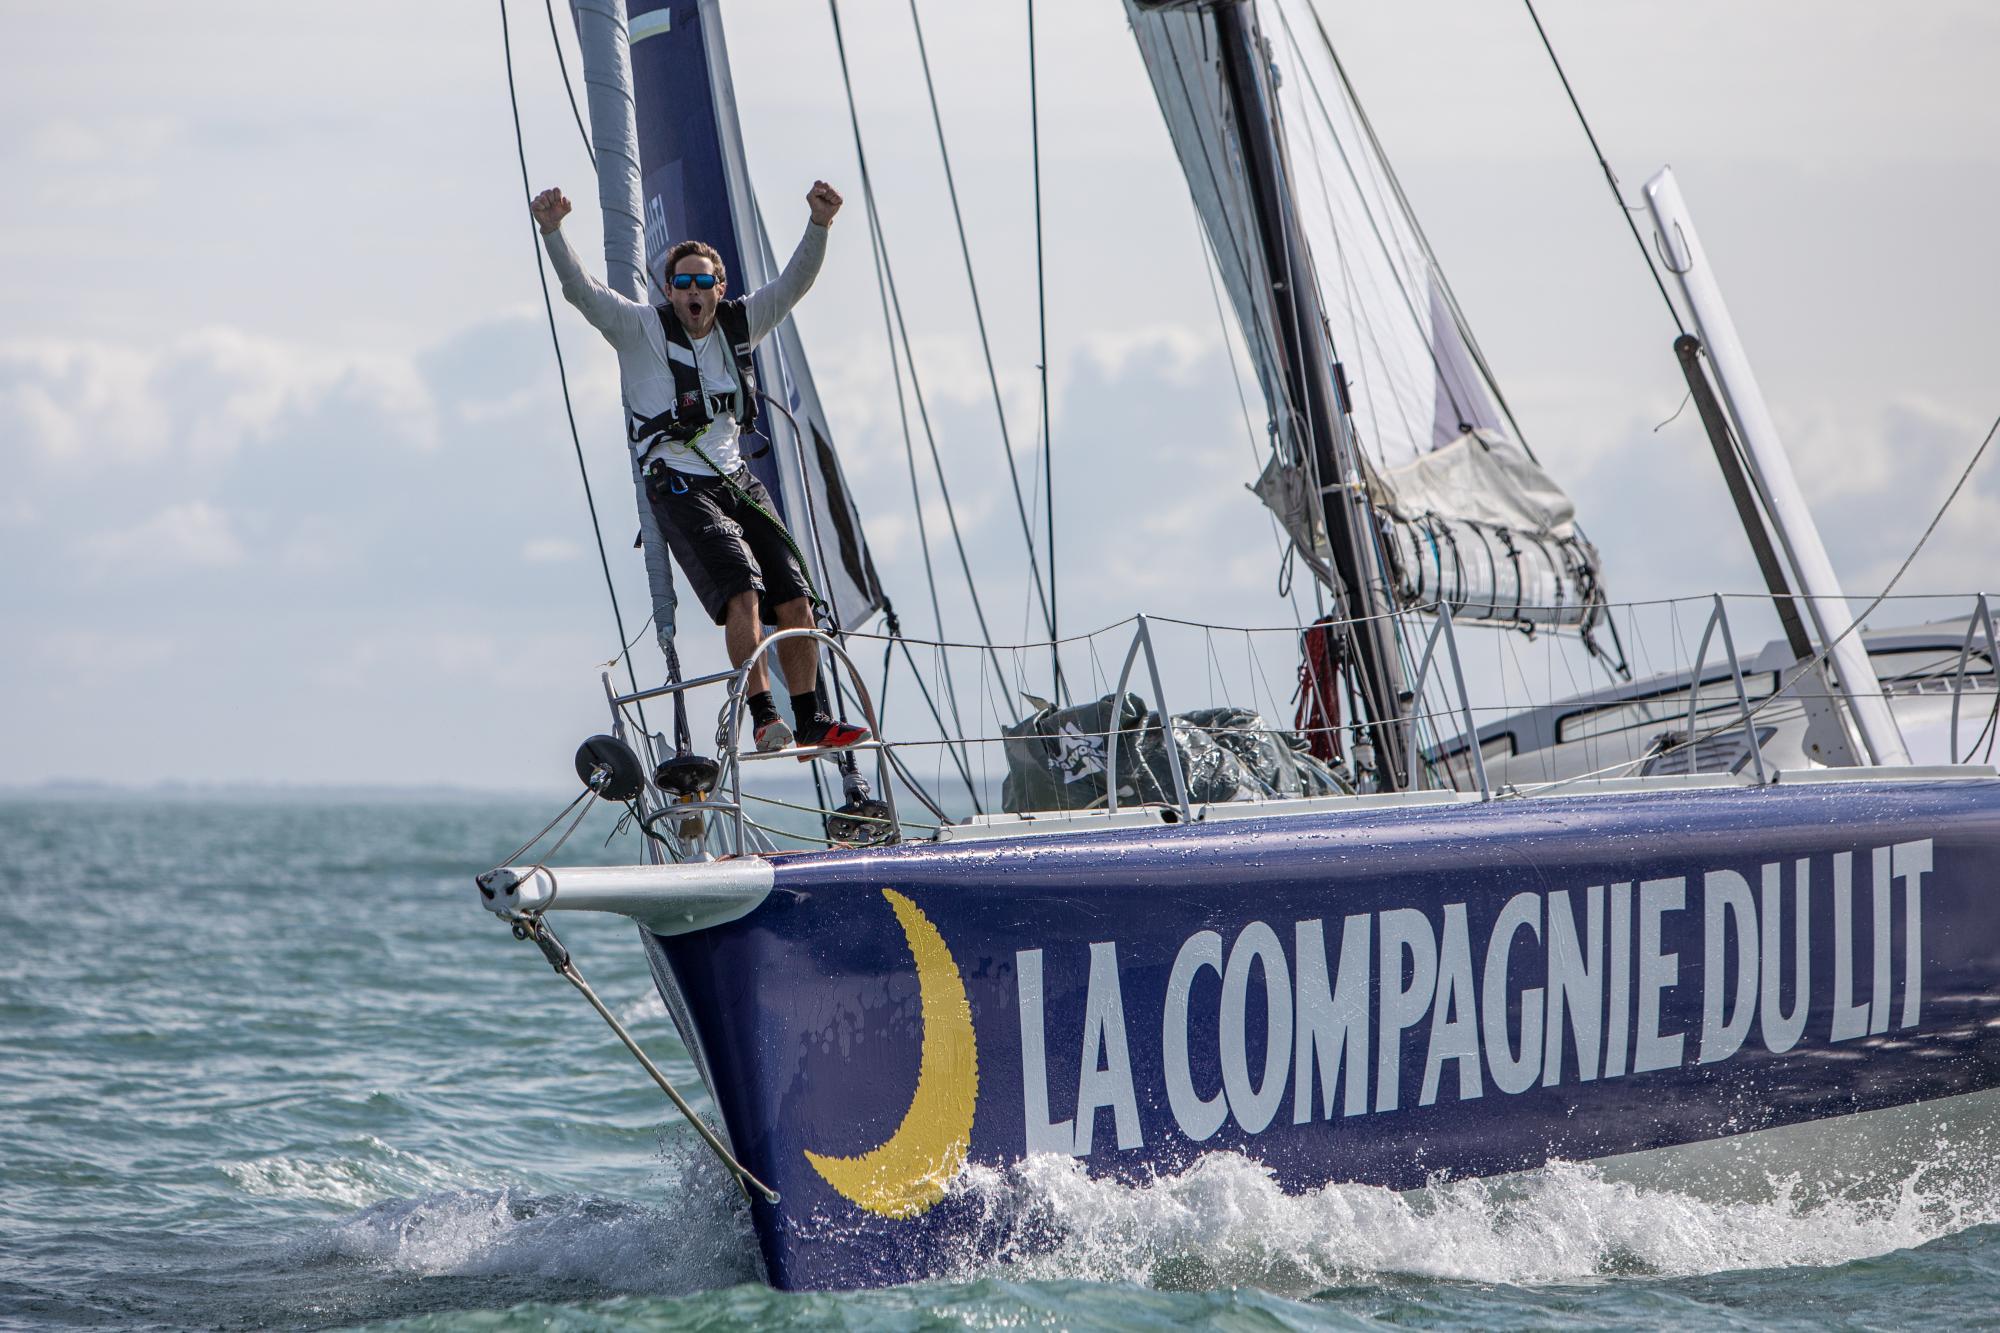 IMOCA Compagnie du Lit / Jiliti - Skipper Clément Giraud